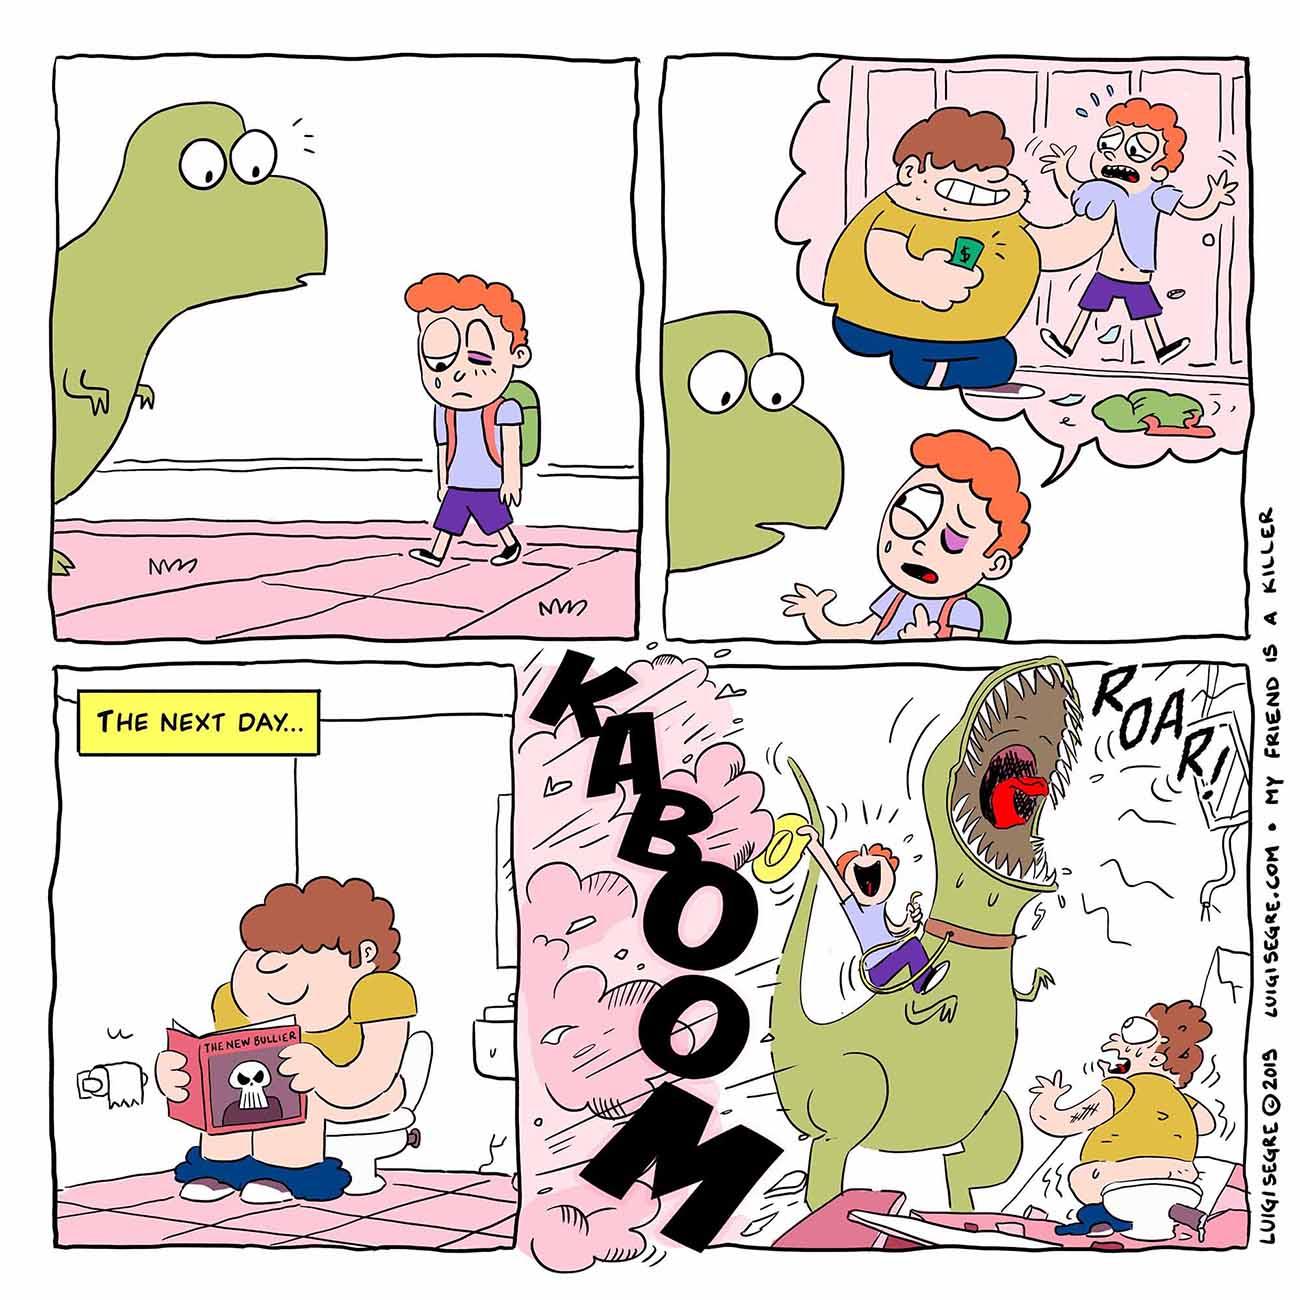 Contenuti_Low_Res_Luigi_Segre_Cartoons_2019_my_friend_is_a_killer_06.jpg